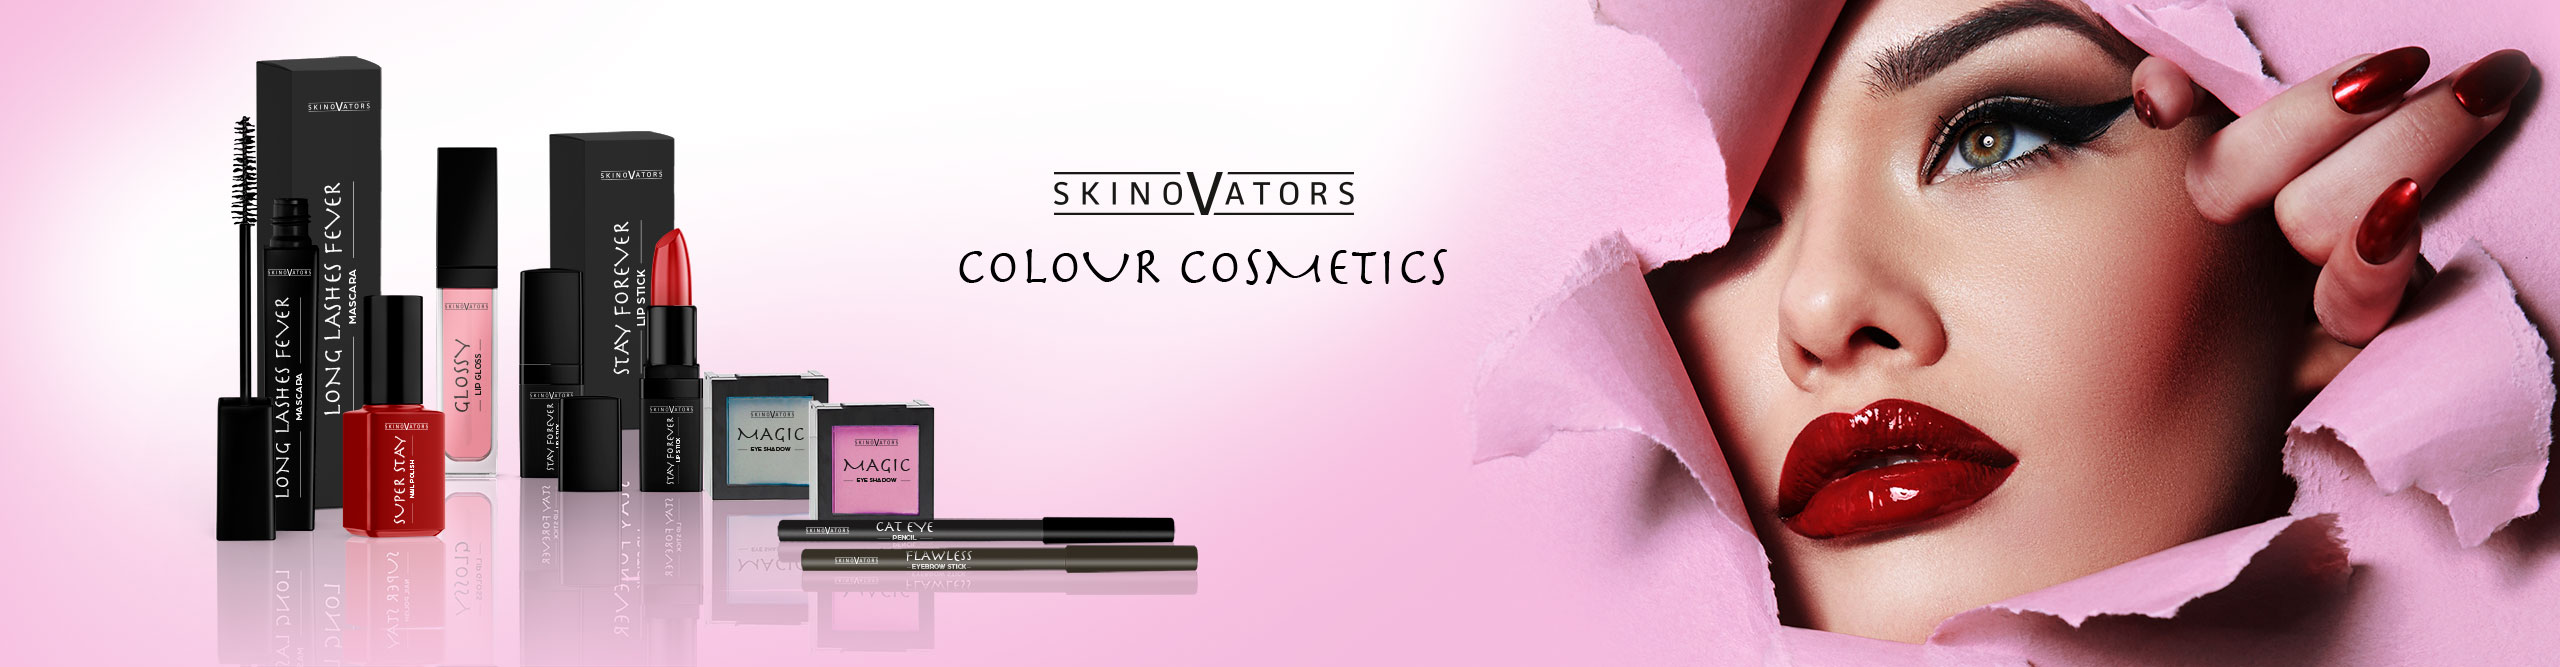 Private Label Cosmetics and Skin Care Germany | SKINOVATORS GmbH